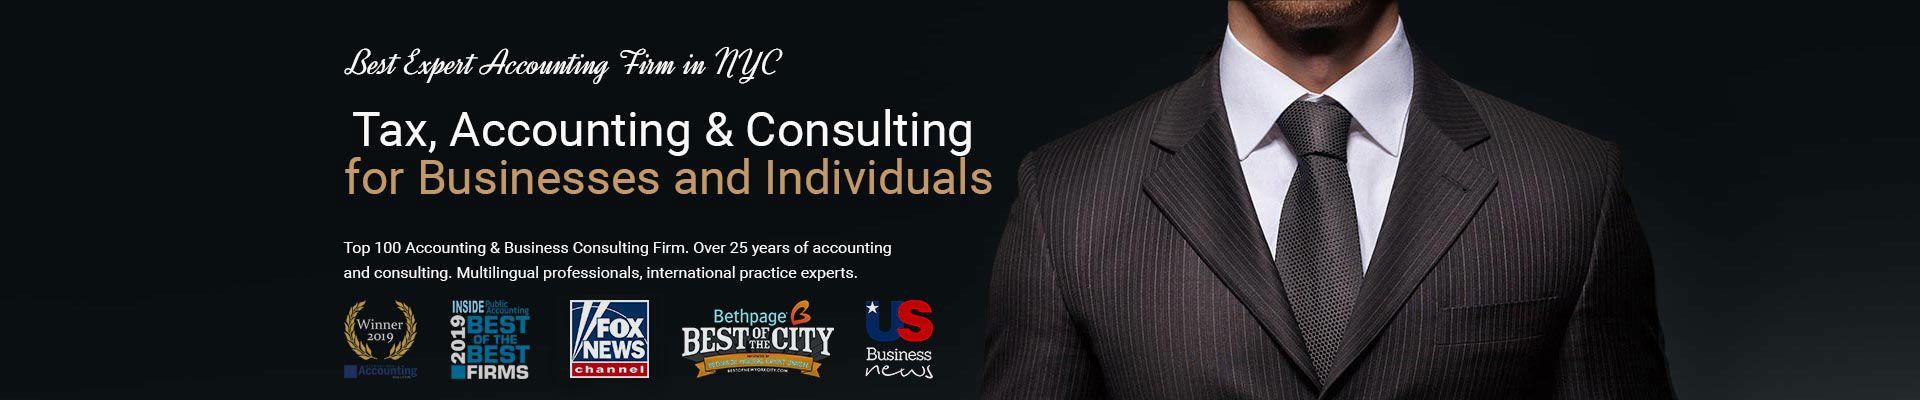 cpa firm located in Manhattan NYC, Queens NYC, Sarasota FL, Washington DC